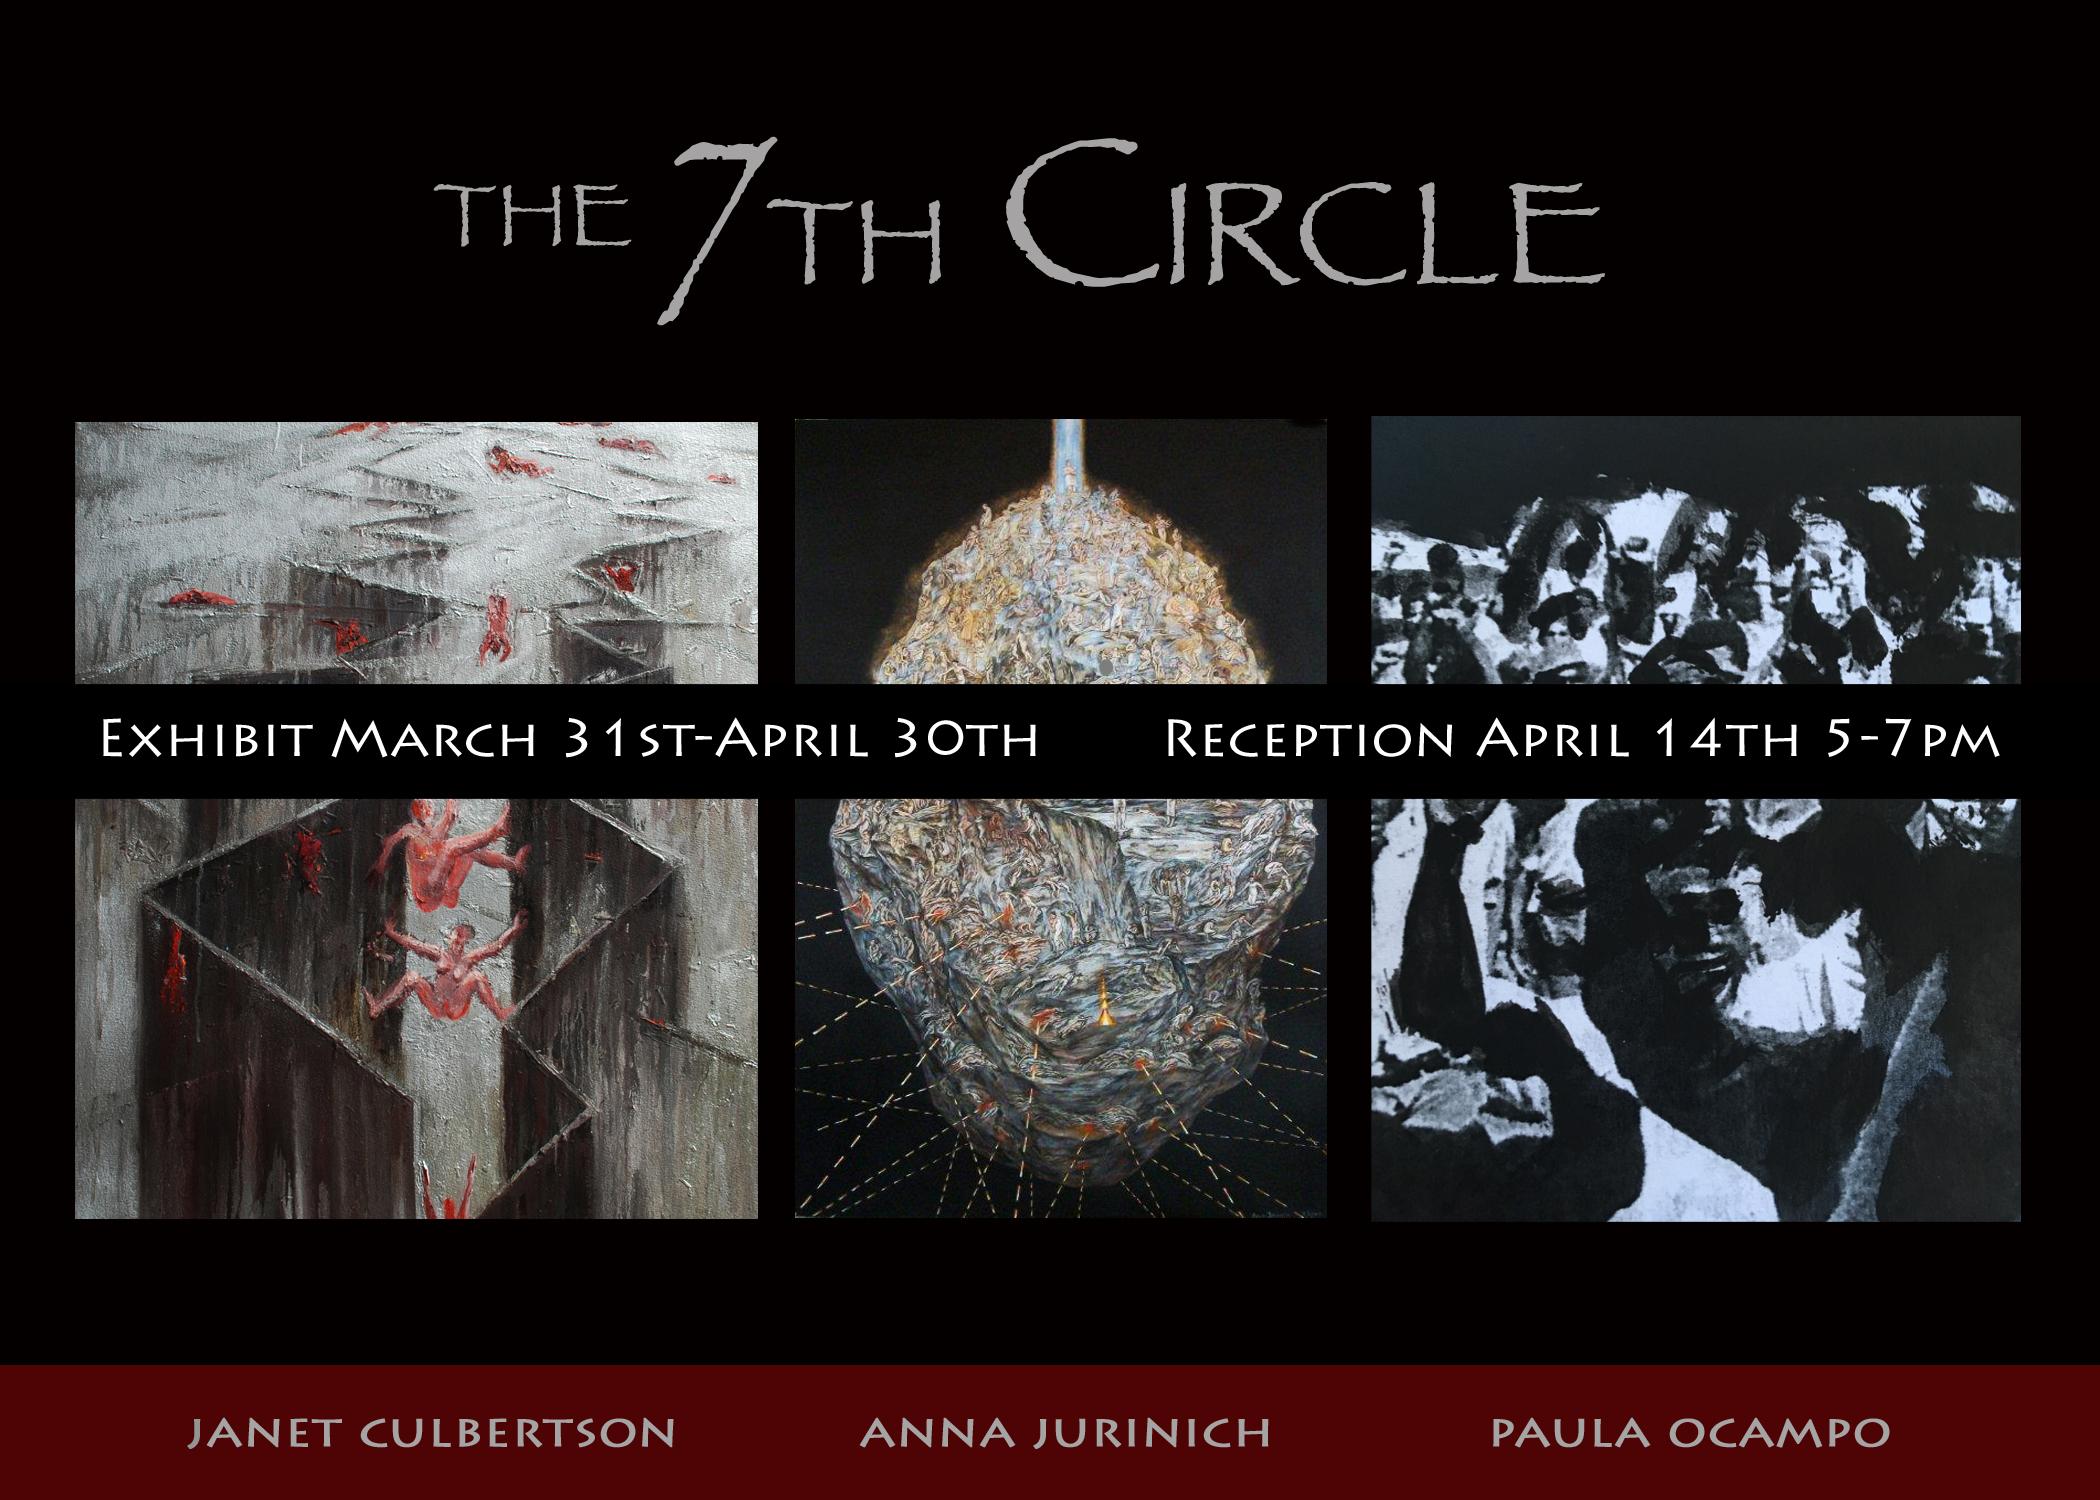 7th Circle Exhibit